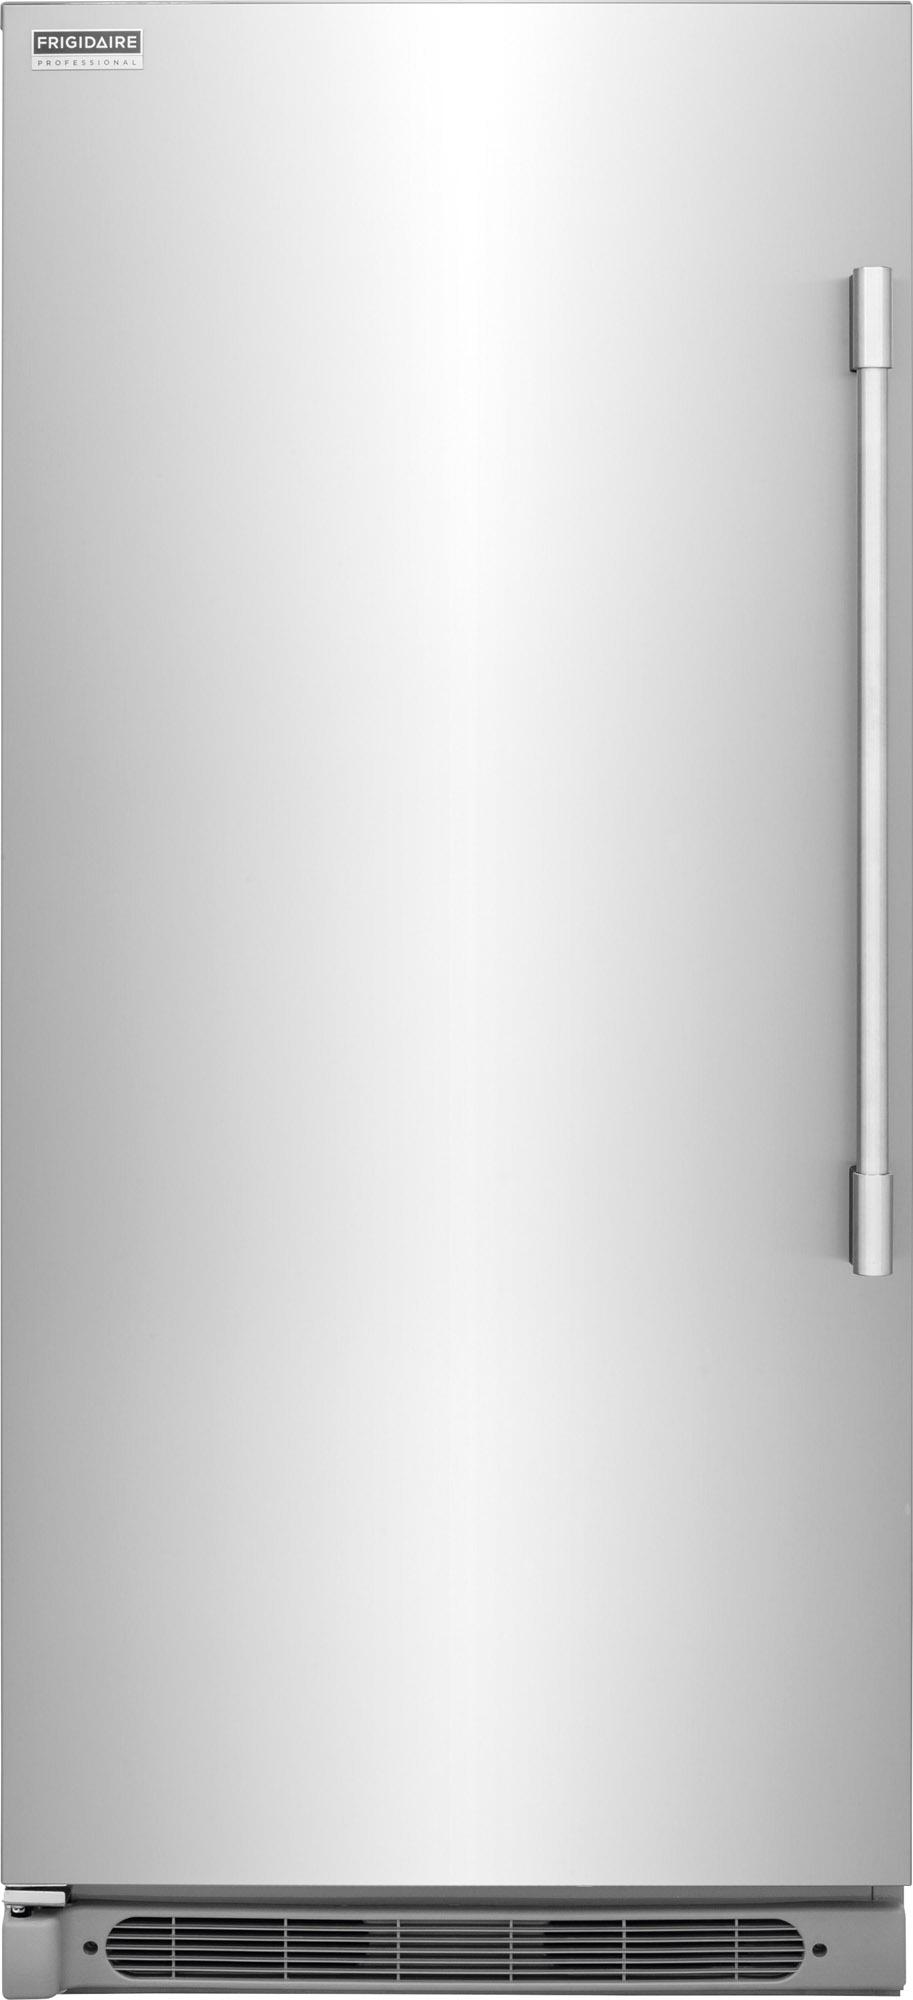 Frigidaire Professional 19 Cu Ft All Freezer Stainless Steel Fpfu19f8rf